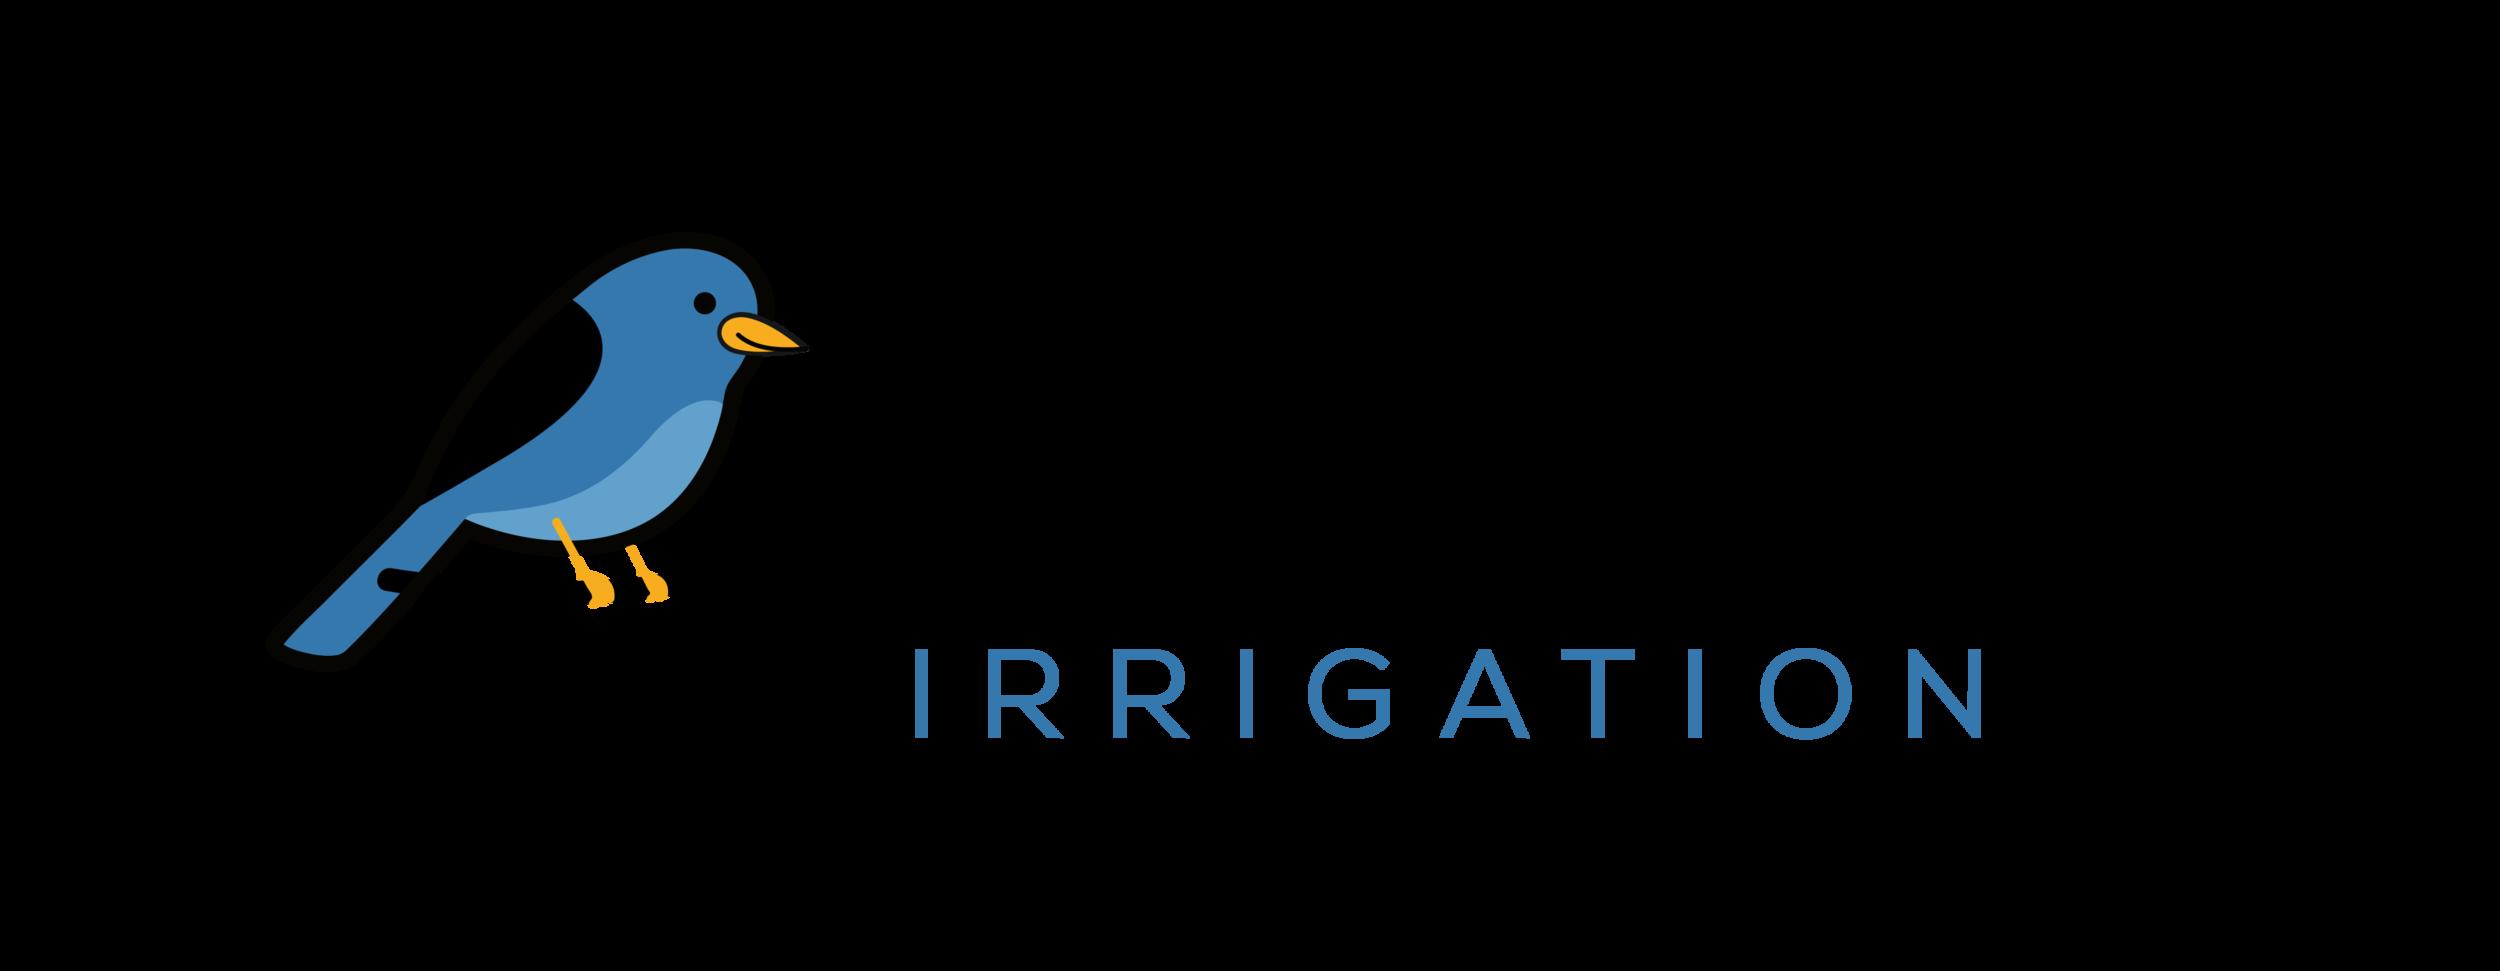 Bluebird horizontal logo for webpage and their work trucks